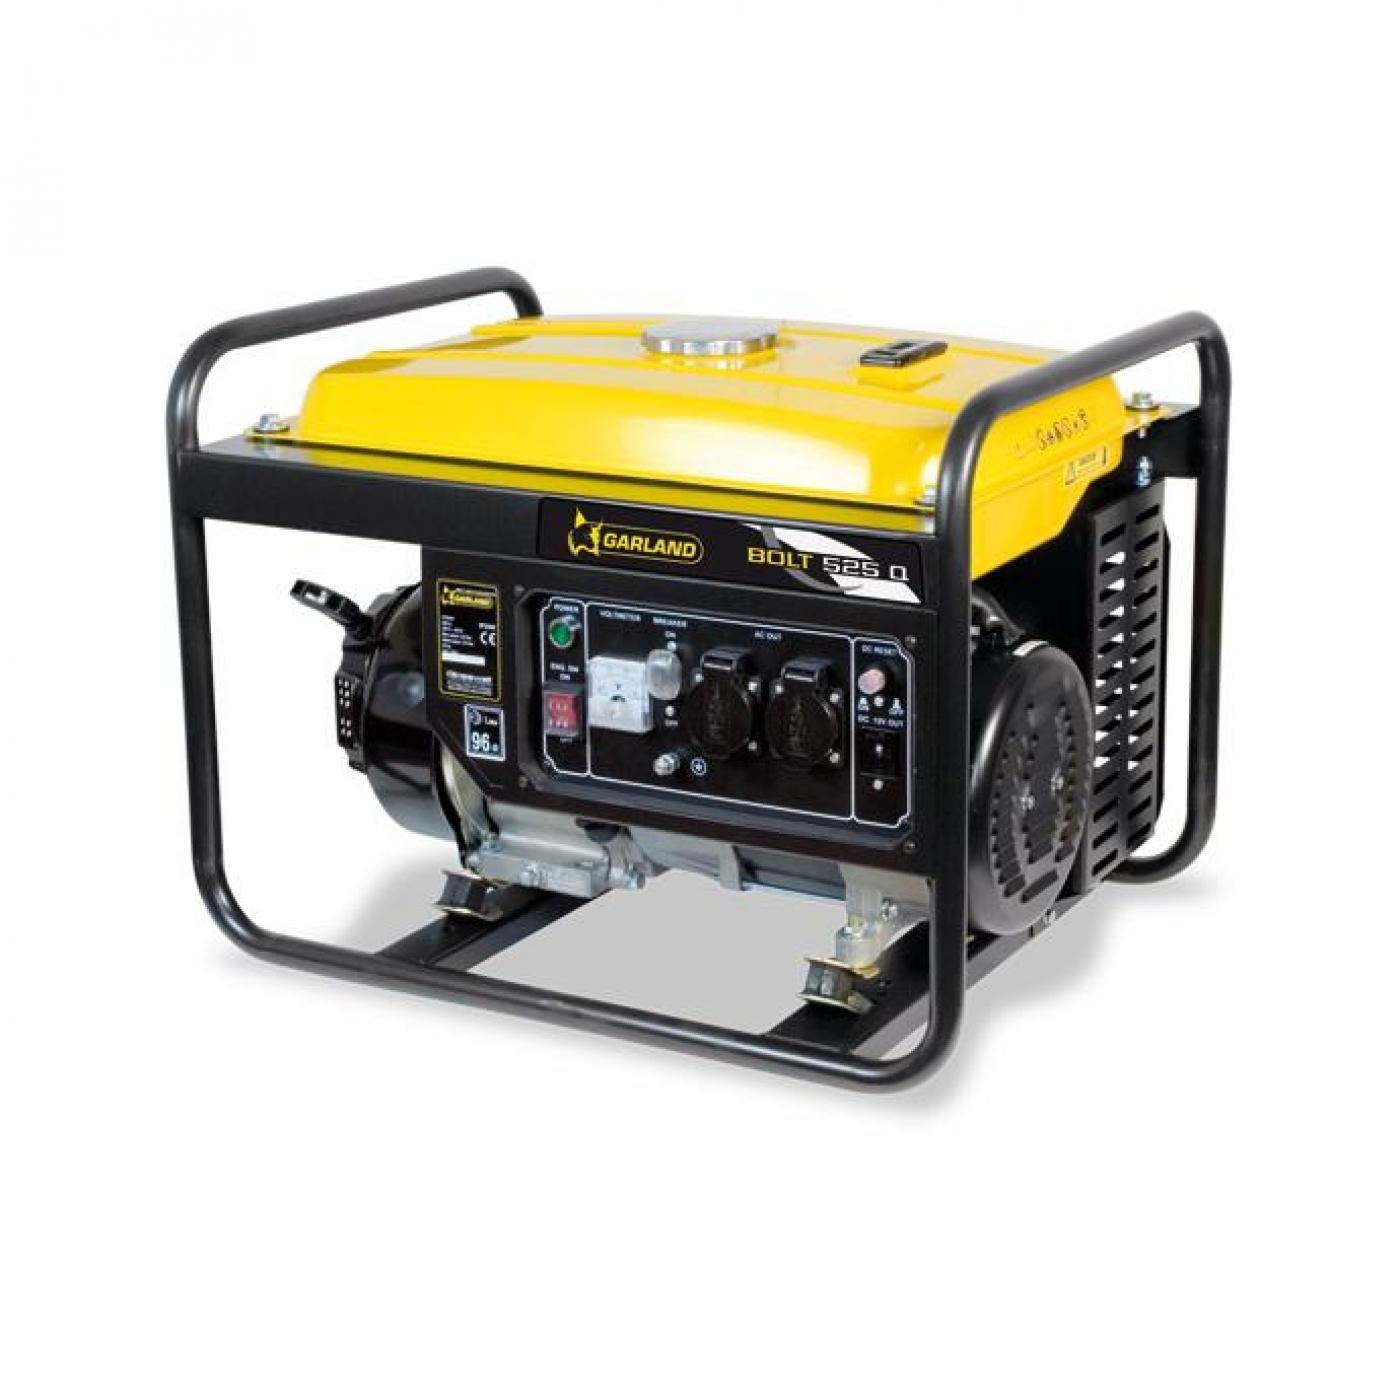 Generador garland bolt 525 q por 359 99 en planeta huerto - Generadores de gasolina ...